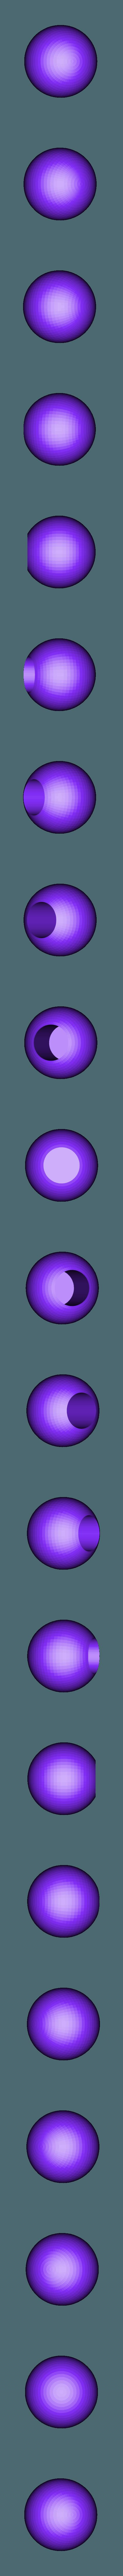 bead.stl Download free STL file Pocket Watch Stand Mk2 • 3D printable template, wjordan819